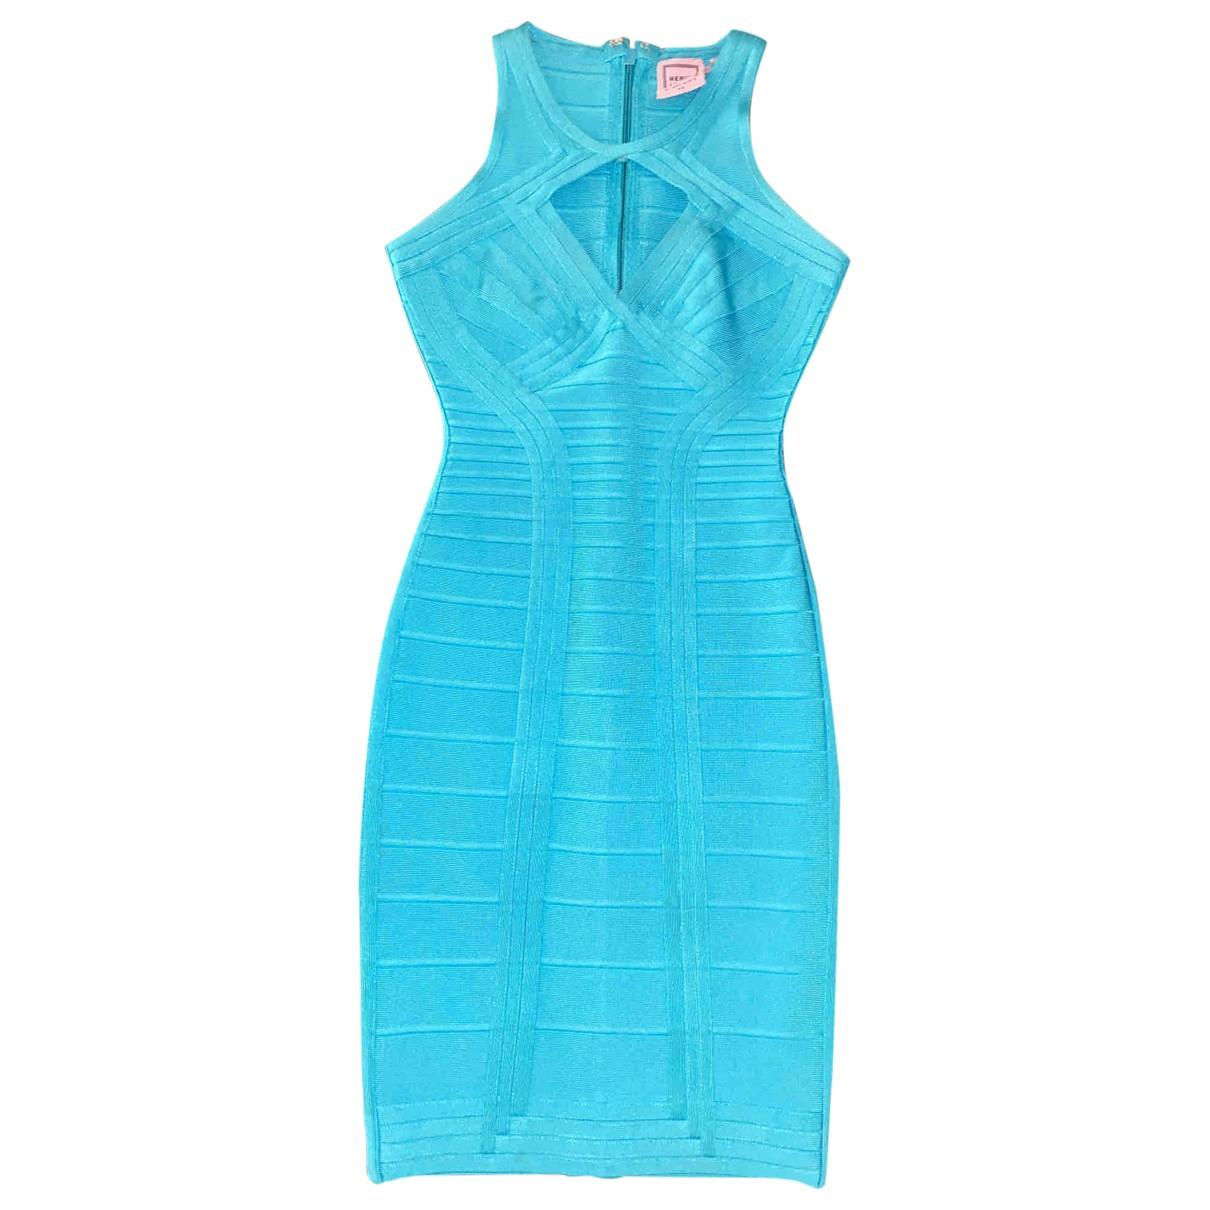 Herve Leger - Robe   pour femme en coton - elasthane - turquoise